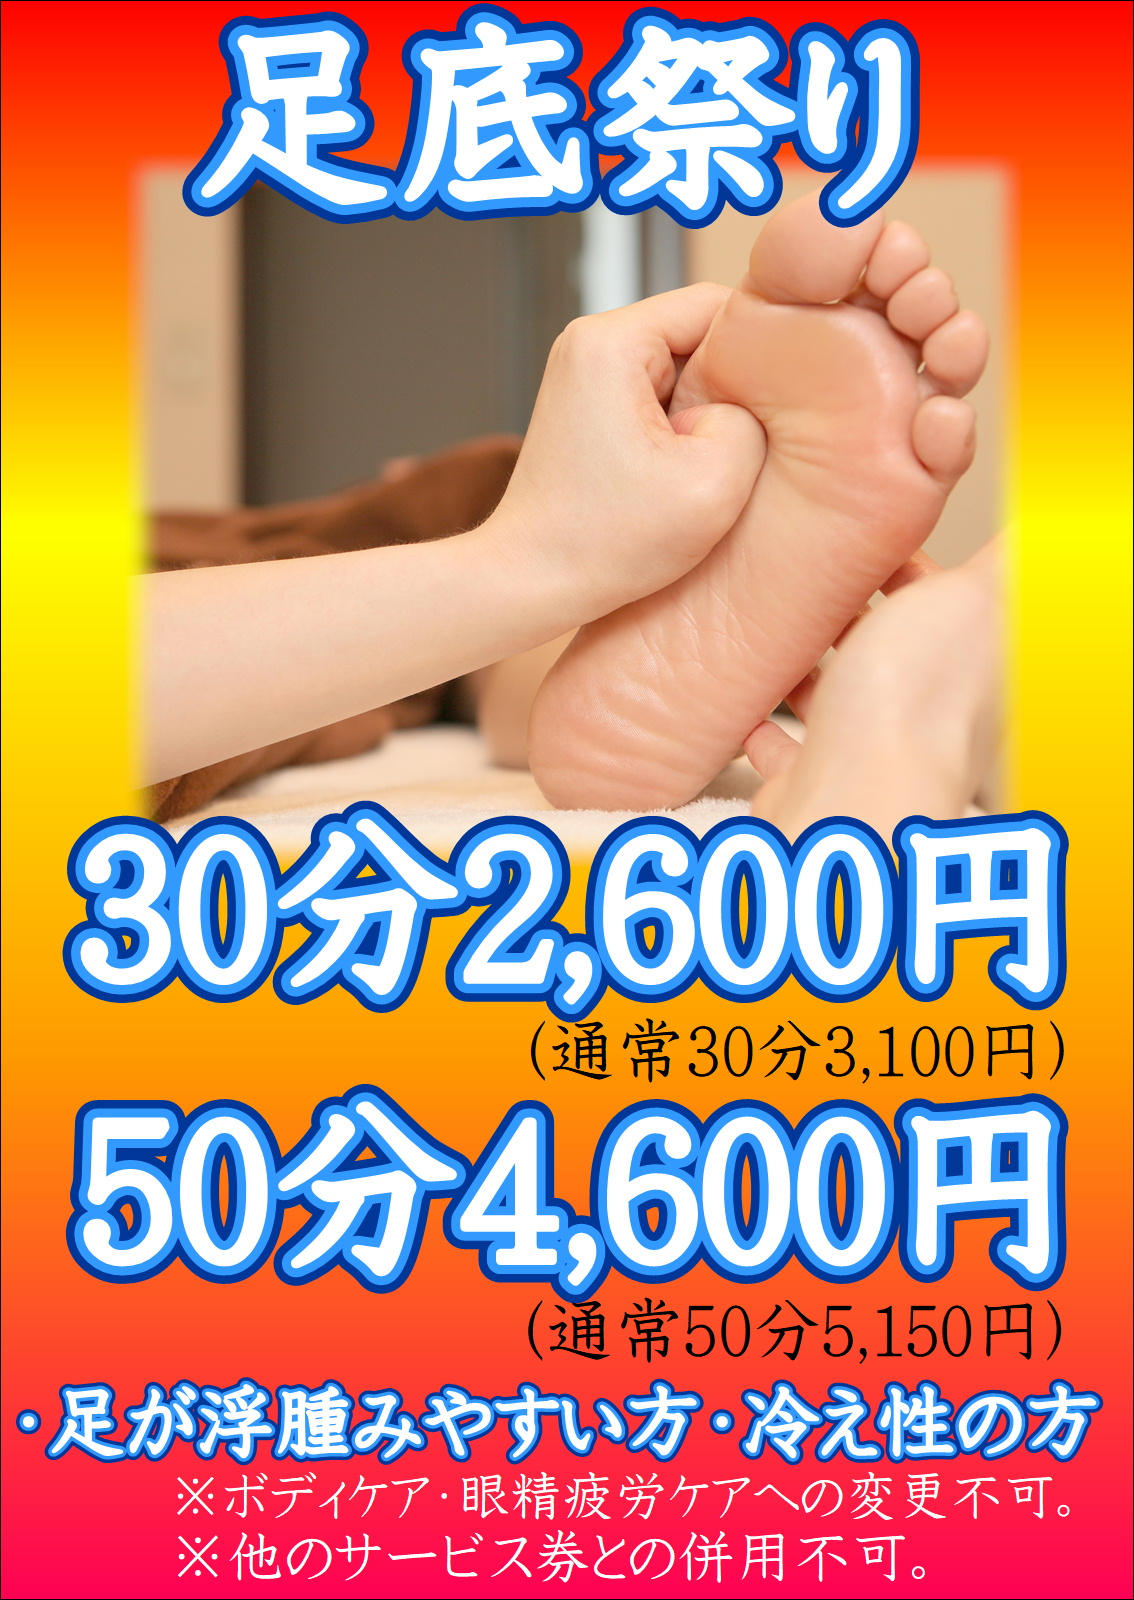 https://hs-nabari.com/event/%E5%90%8D%E5%BC%B5%E5%BA%97%E3%80%80%E8%B6%B3%E5%BA%95%E7%A5%AD%E3%82%8A.JPEG